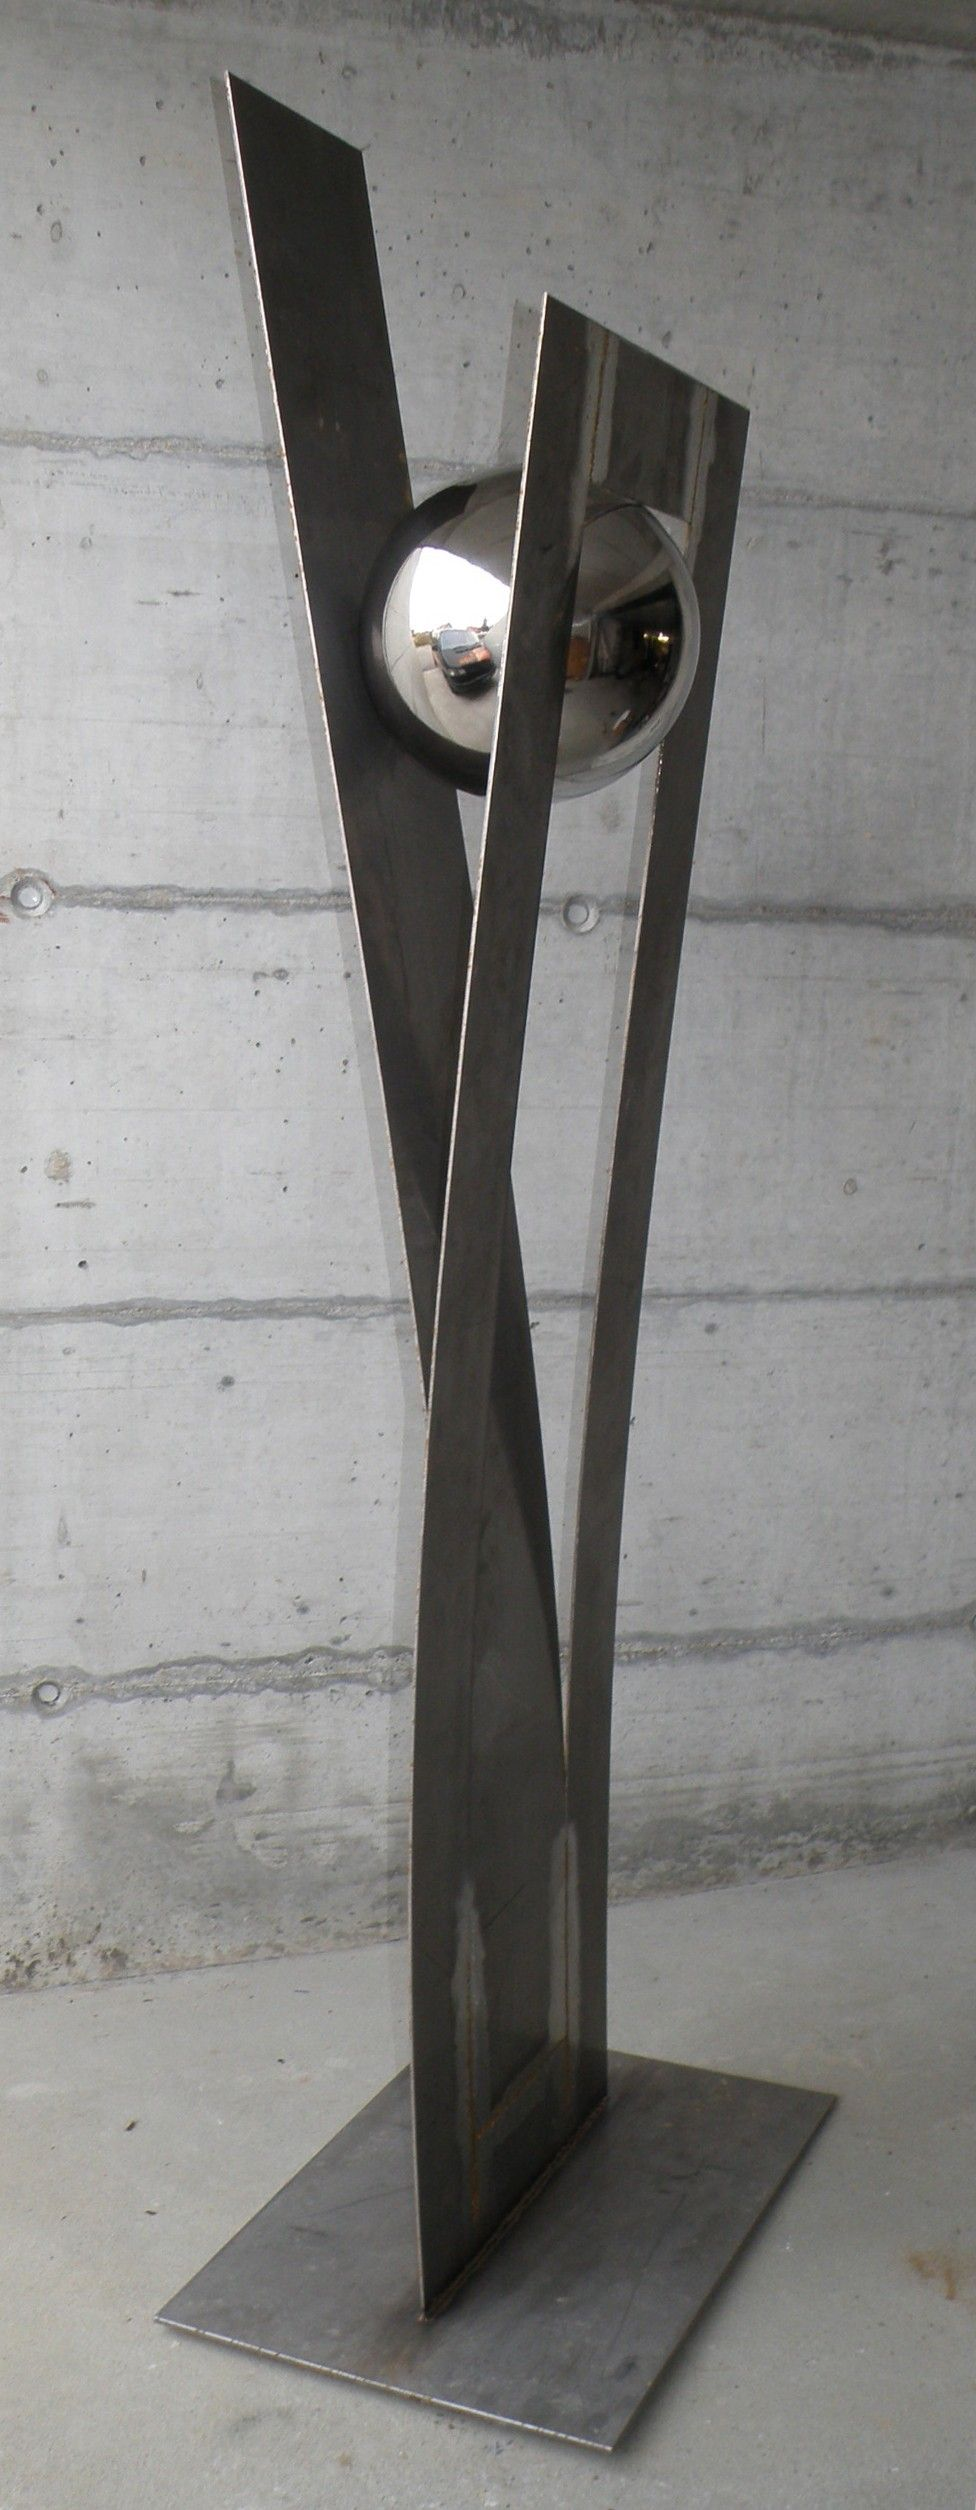 25 einzigartig skulpturen garten modern gedanke haus design ideen. Black Bedroom Furniture Sets. Home Design Ideas